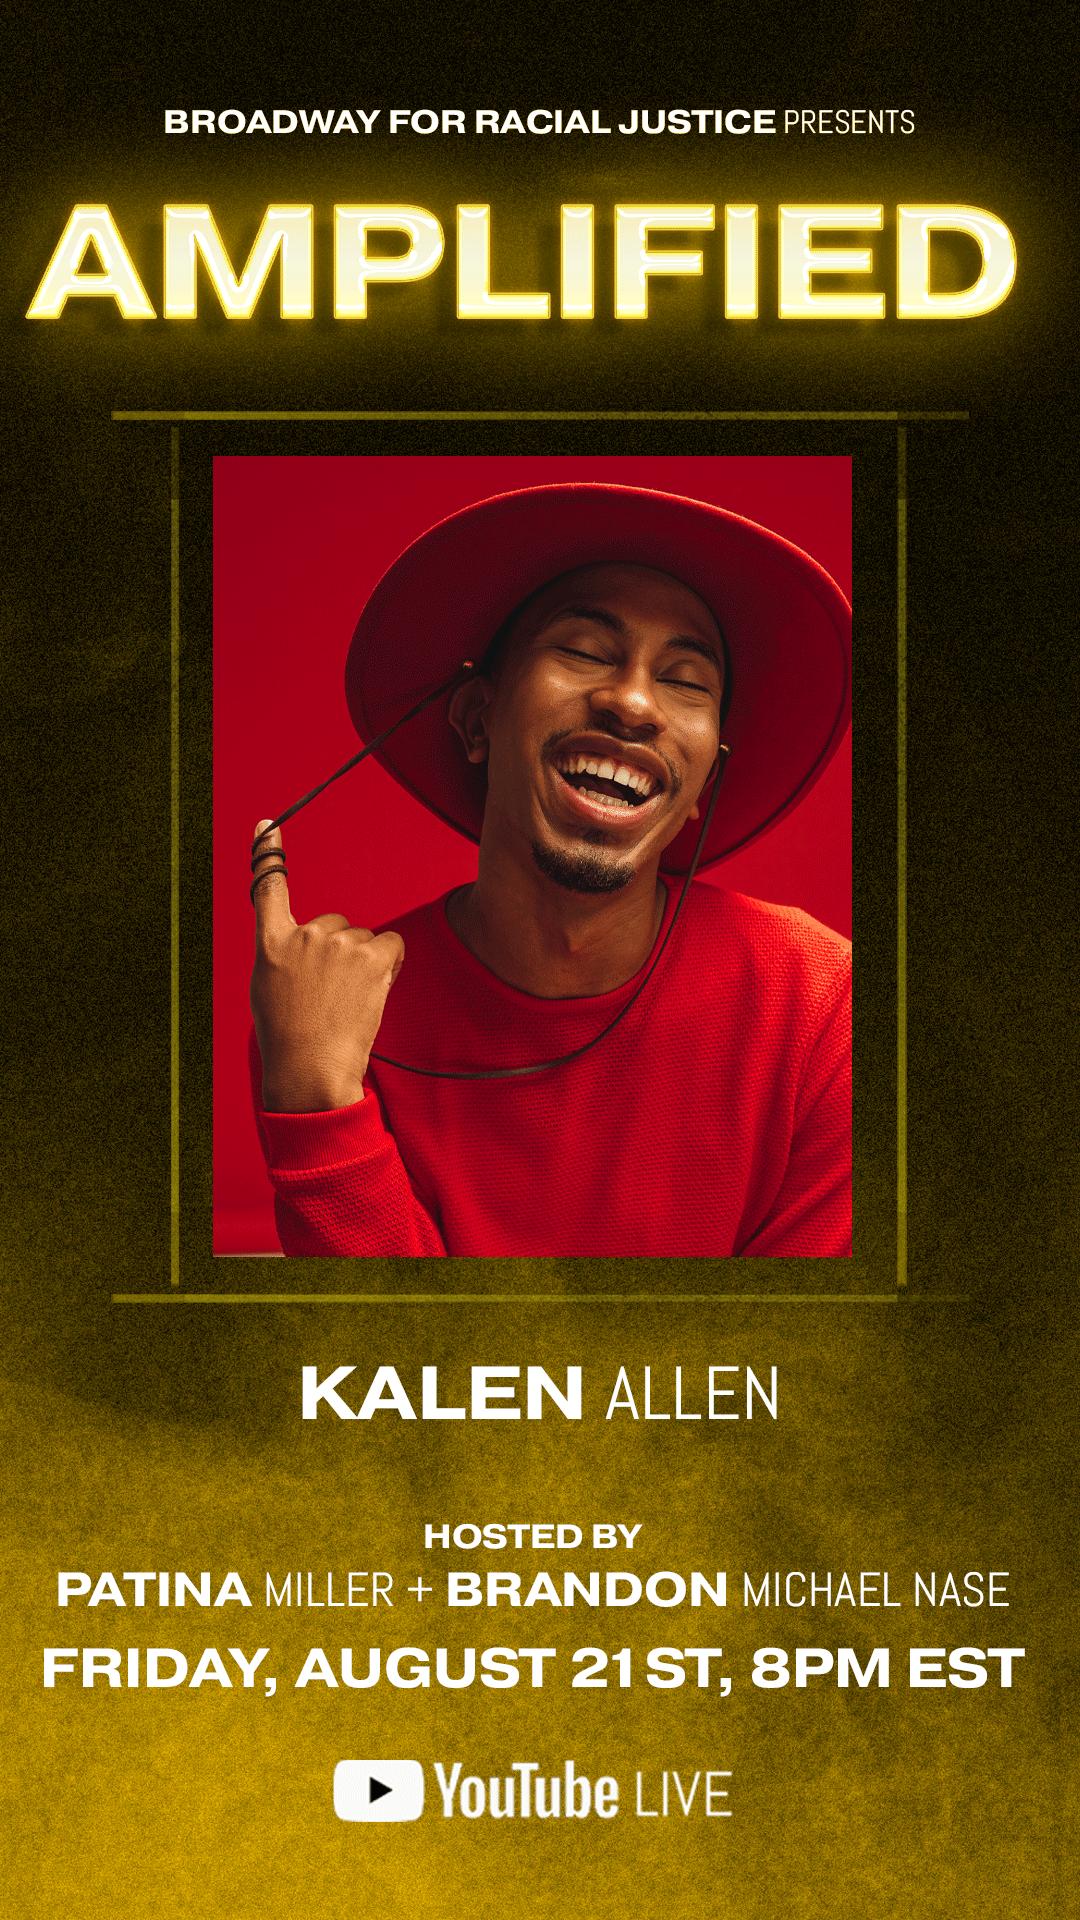 KalenAllenStory